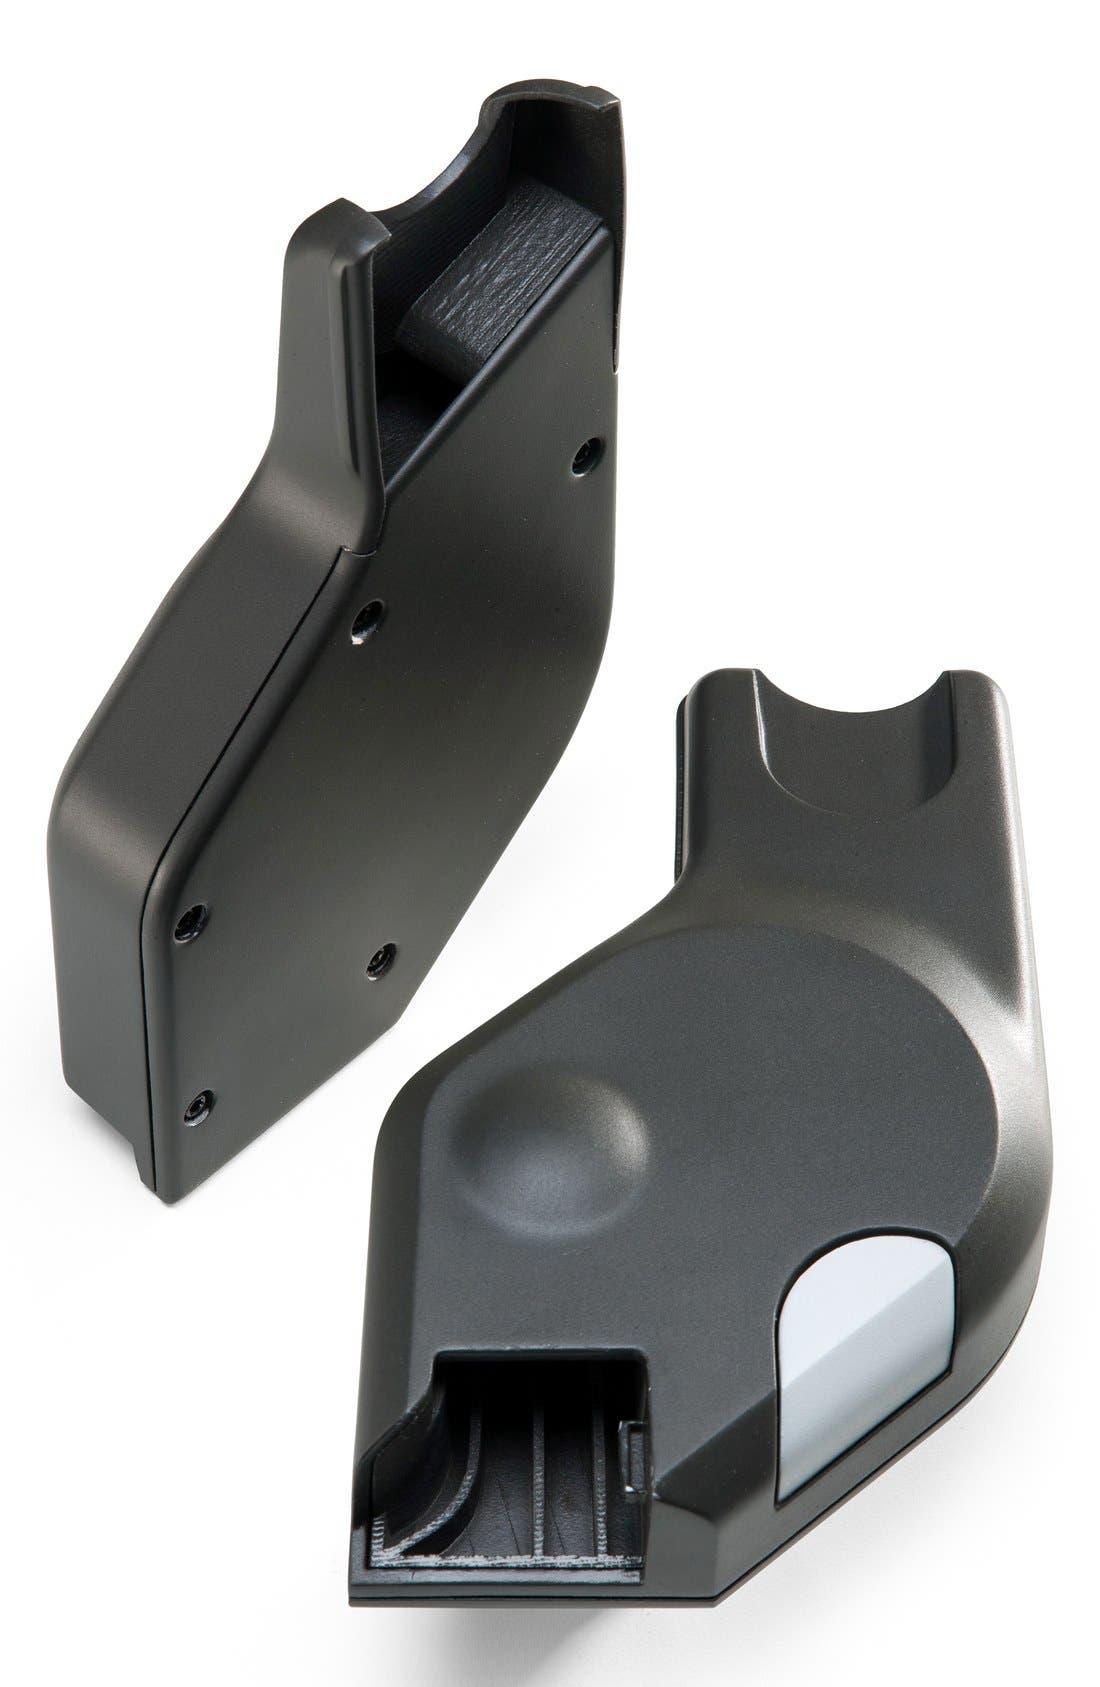 'Xplory<sup>®</sup>' & Stokke 'Scoot' Car Seat Adaptor for Maxi Cosi & Nuna,                             Main thumbnail 1, color,                             DARK GREY